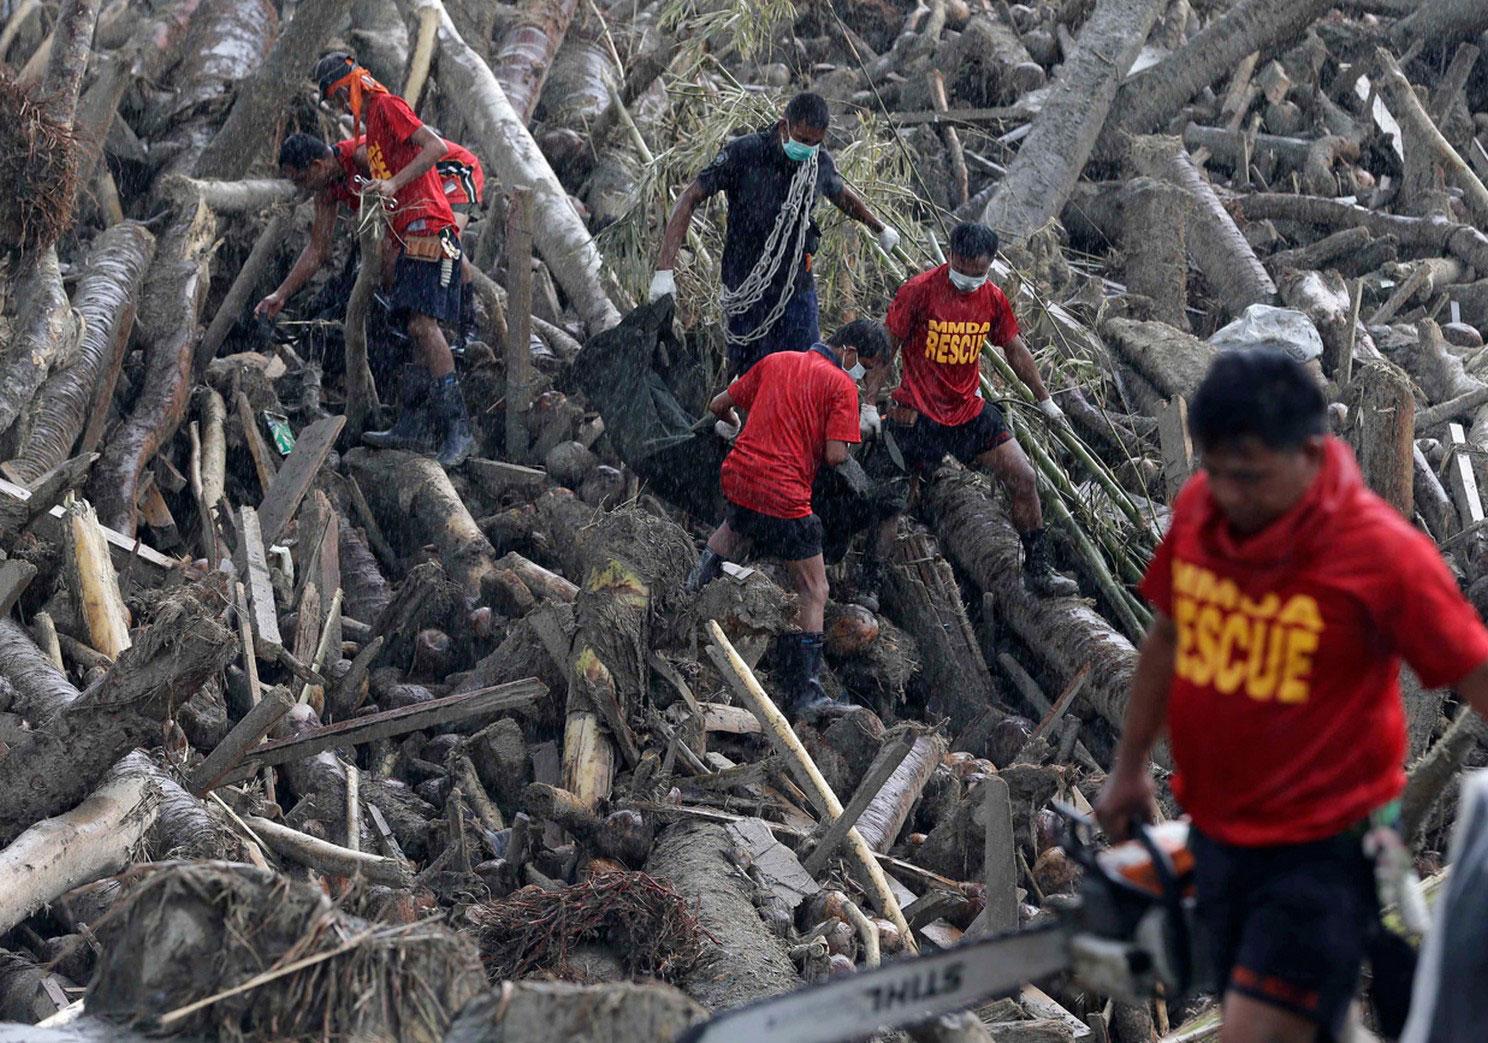 спасатели извлекают тела погибших, фото